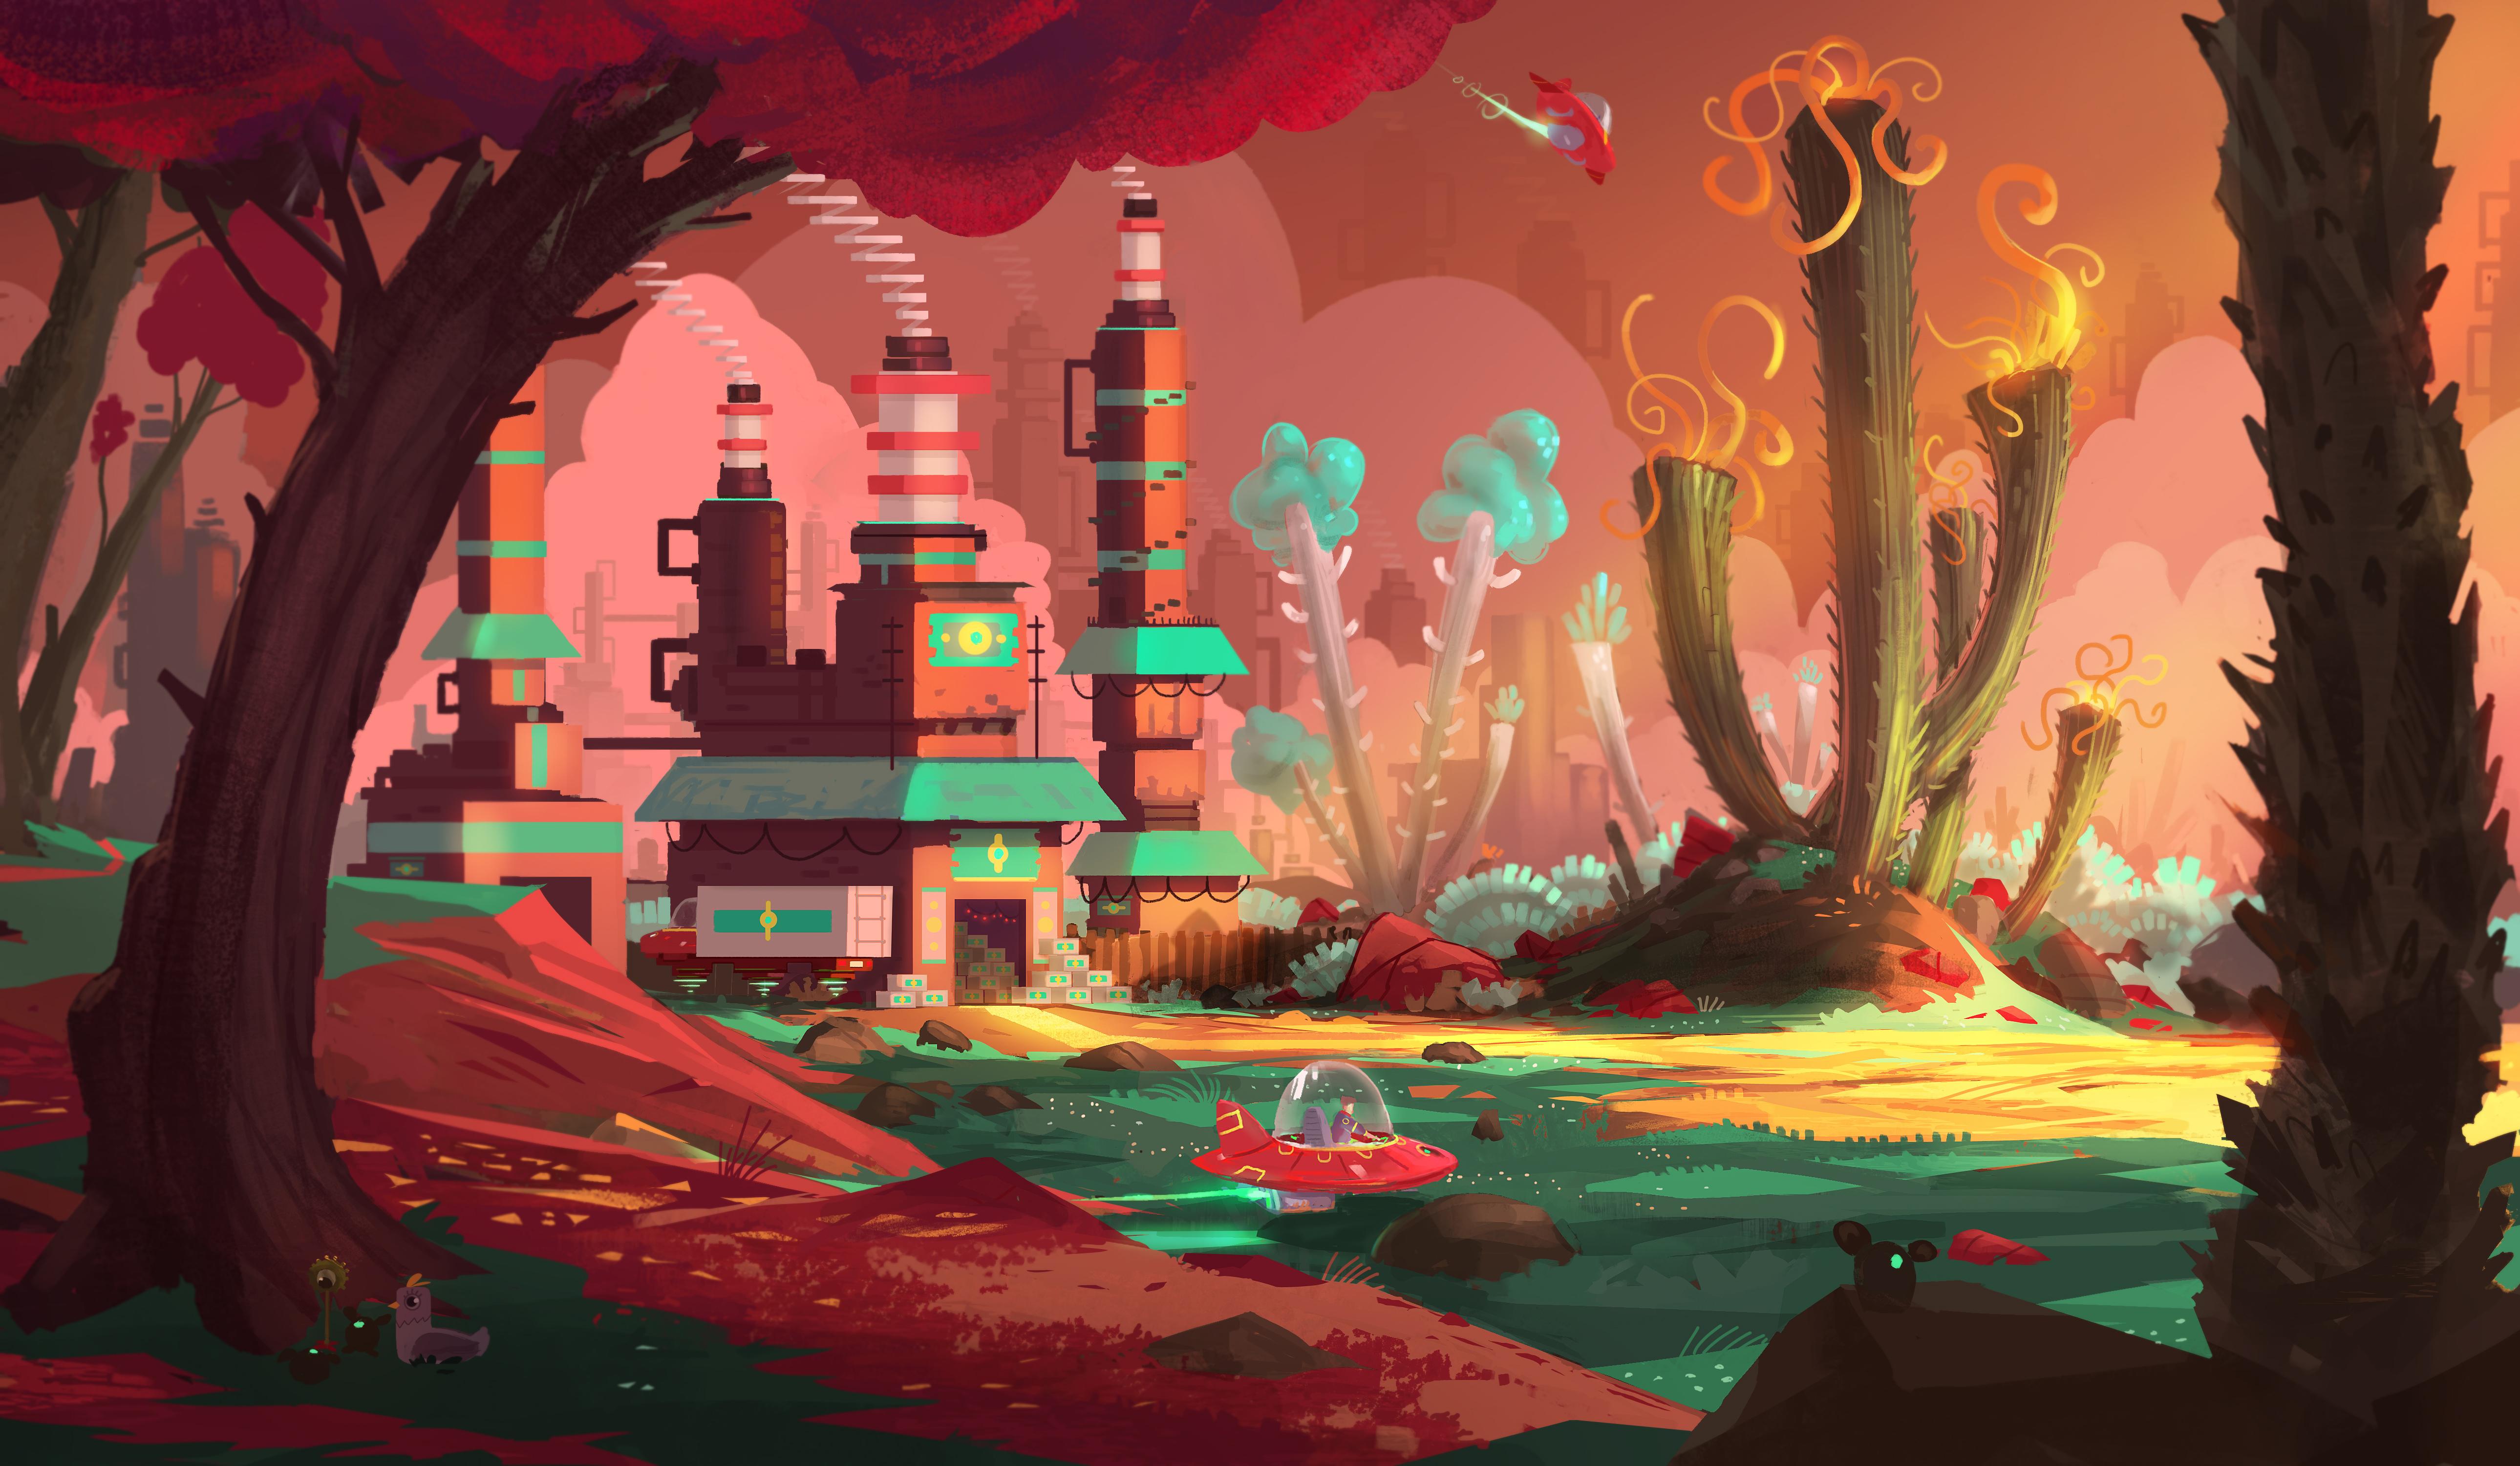 Sci Fi Landscape 5158x3000